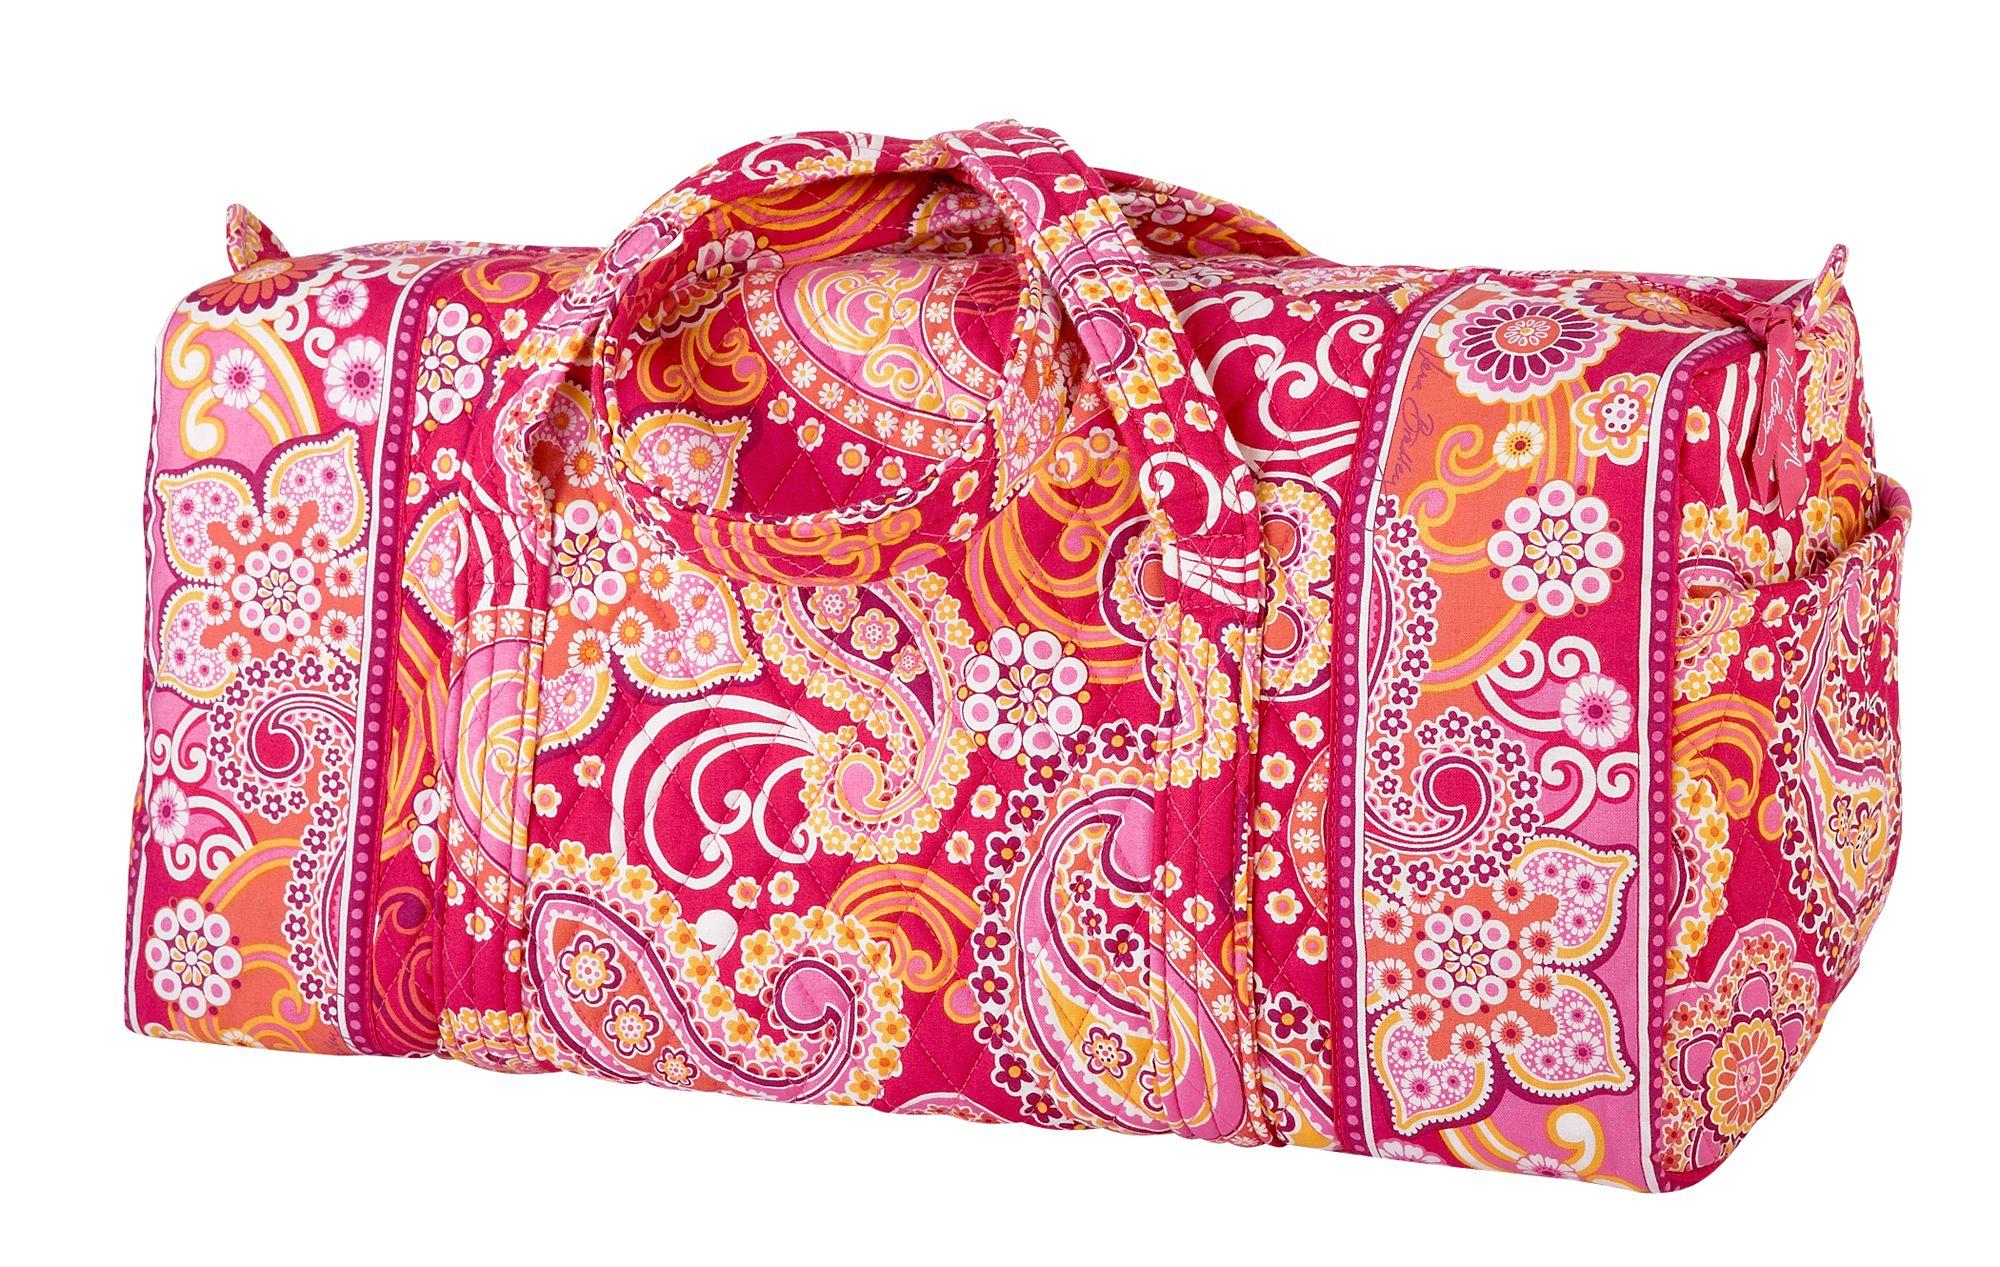 Image Result For Duffel Bag